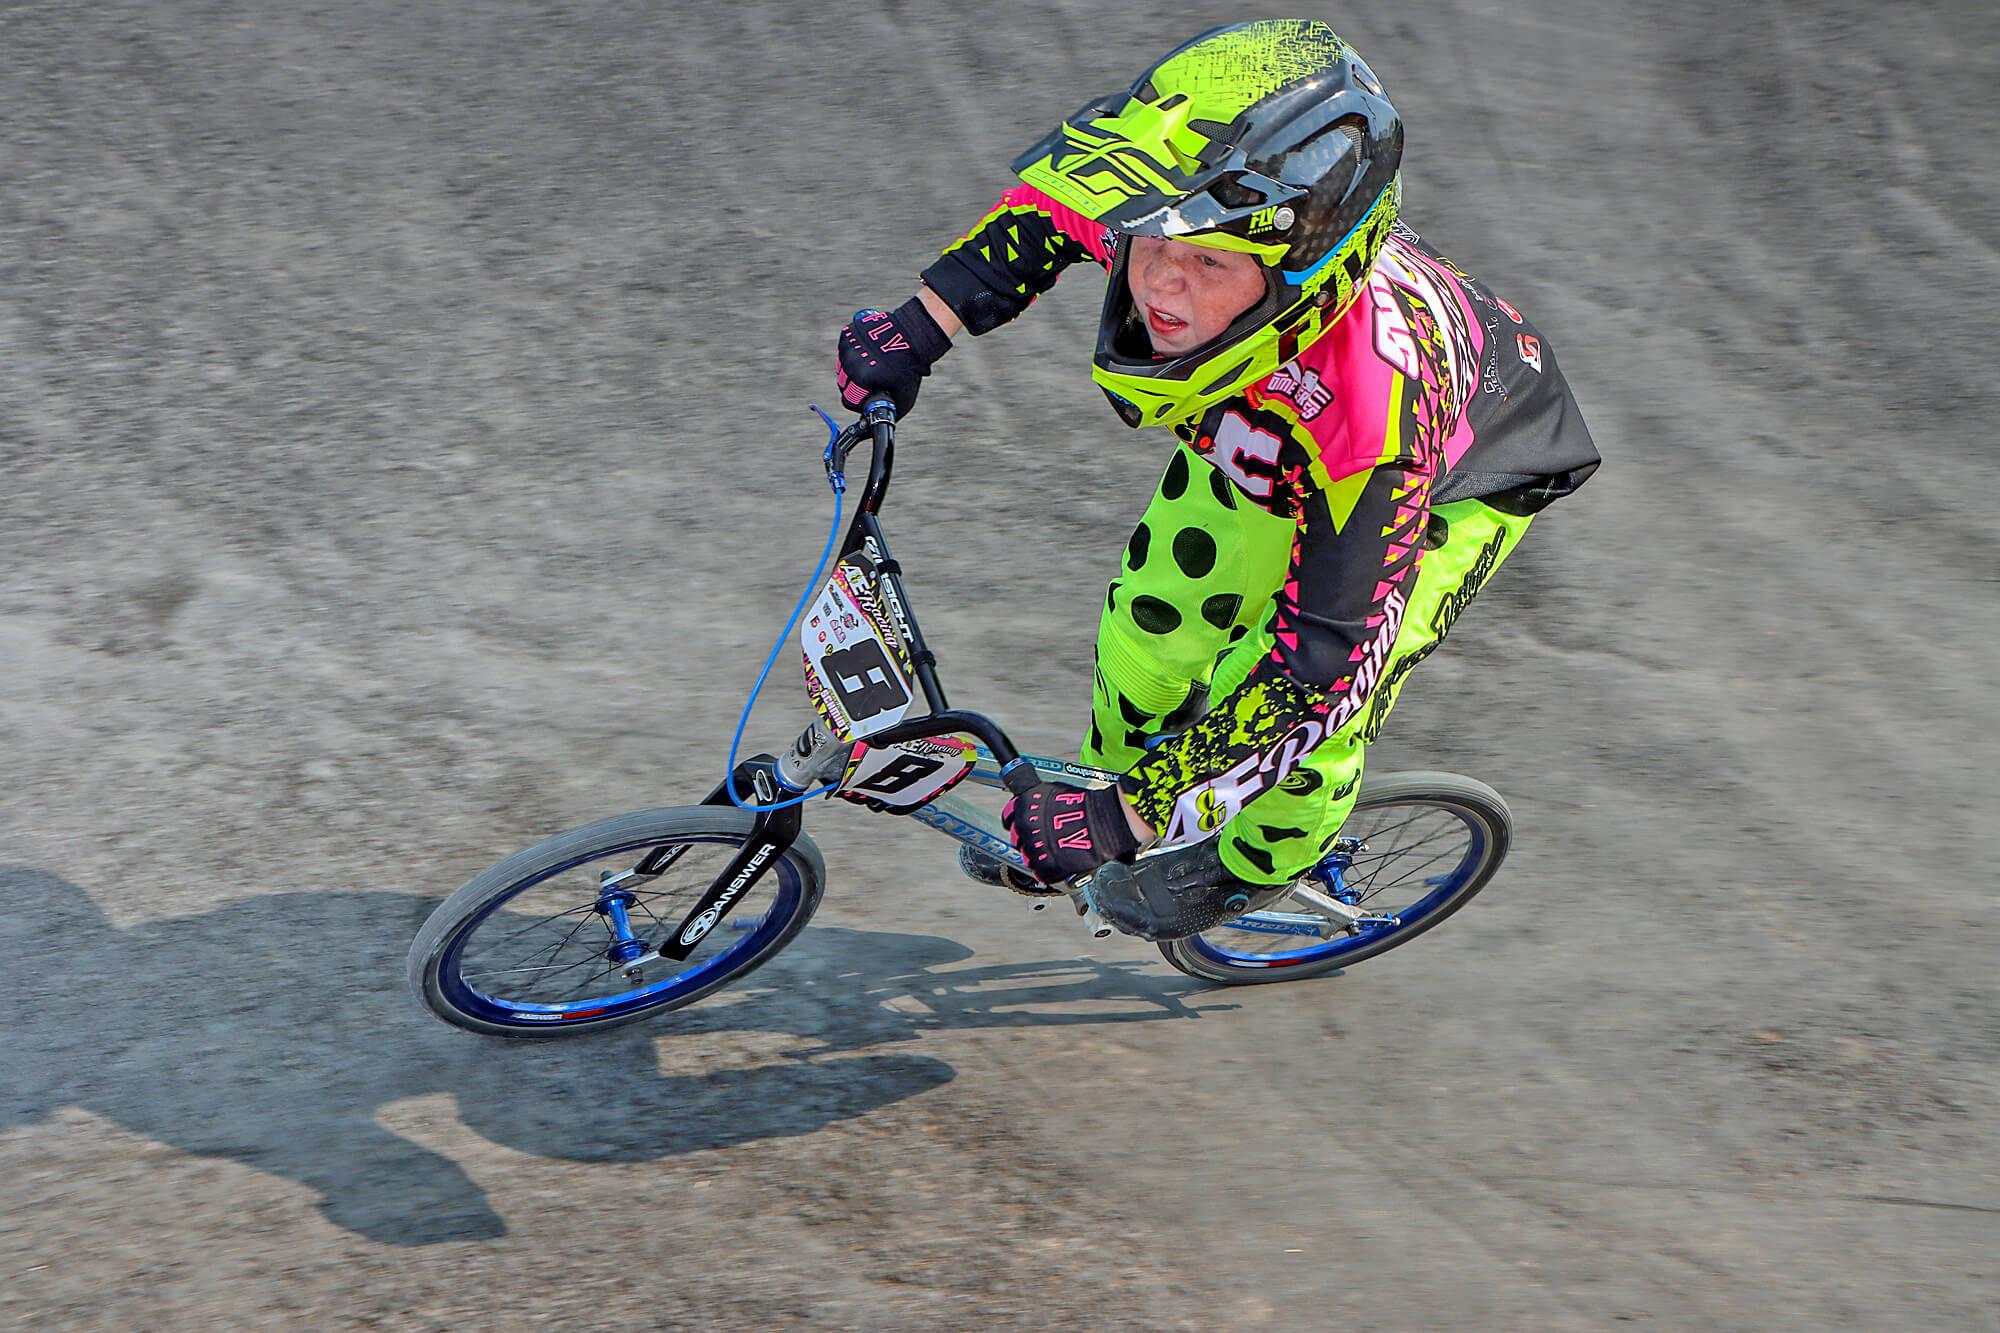 USA BMX Derby City 2020 - Jerry Landrum - 0180-2000FX